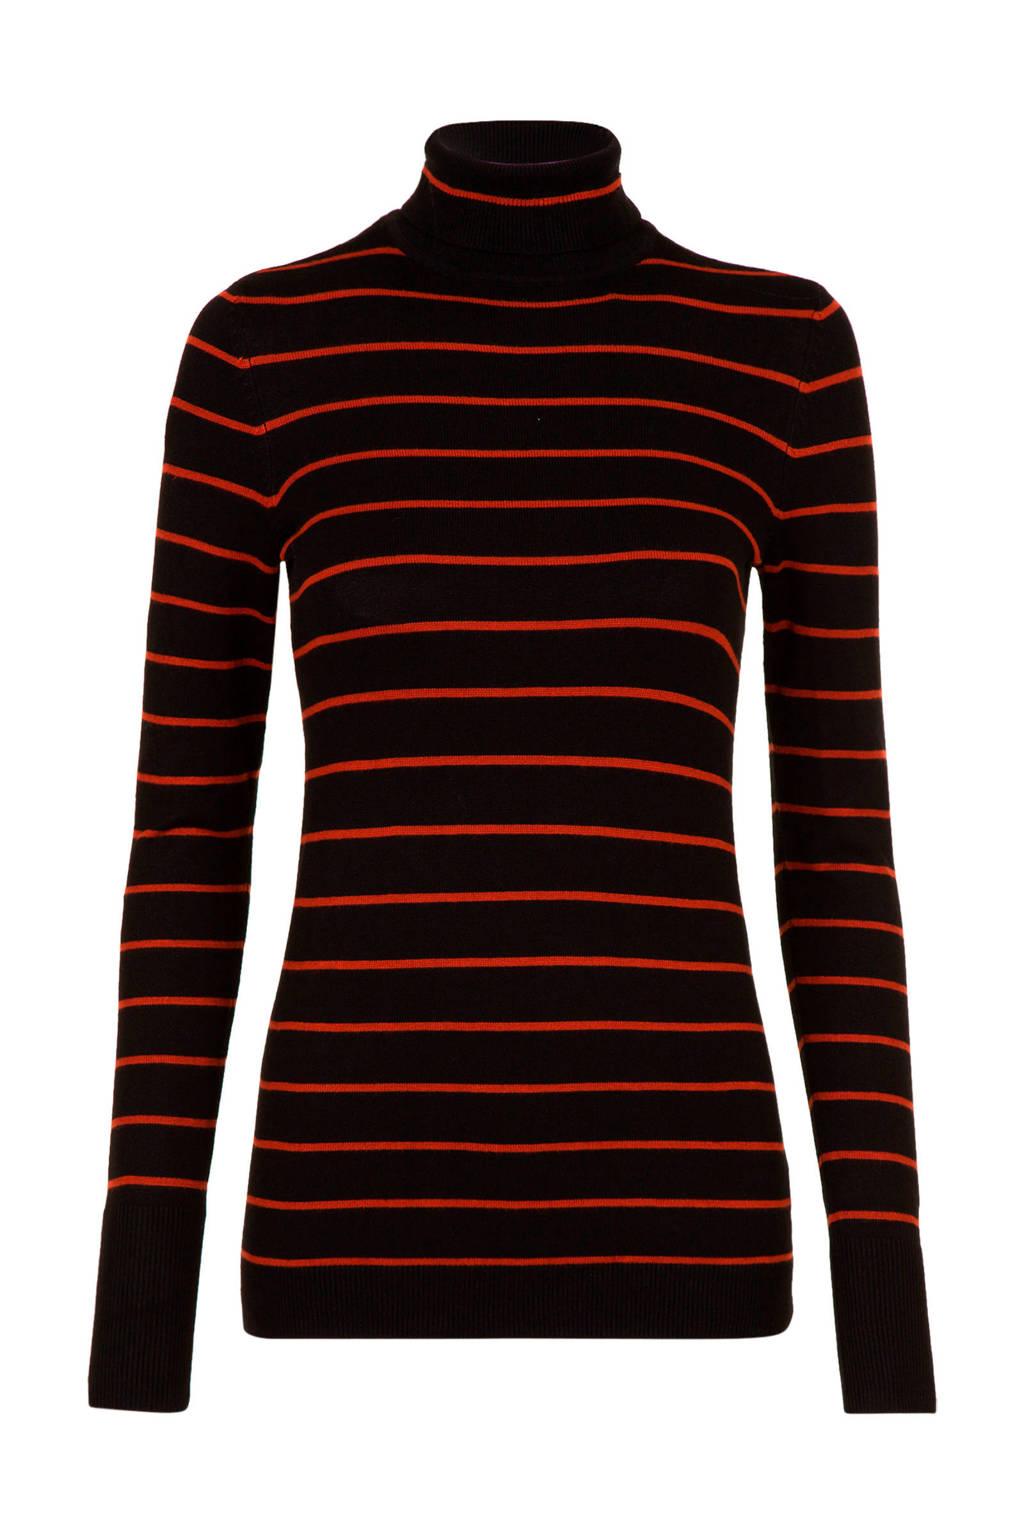 Miss Etam Lang gestreepte top zwart/rood, Zwart/rood